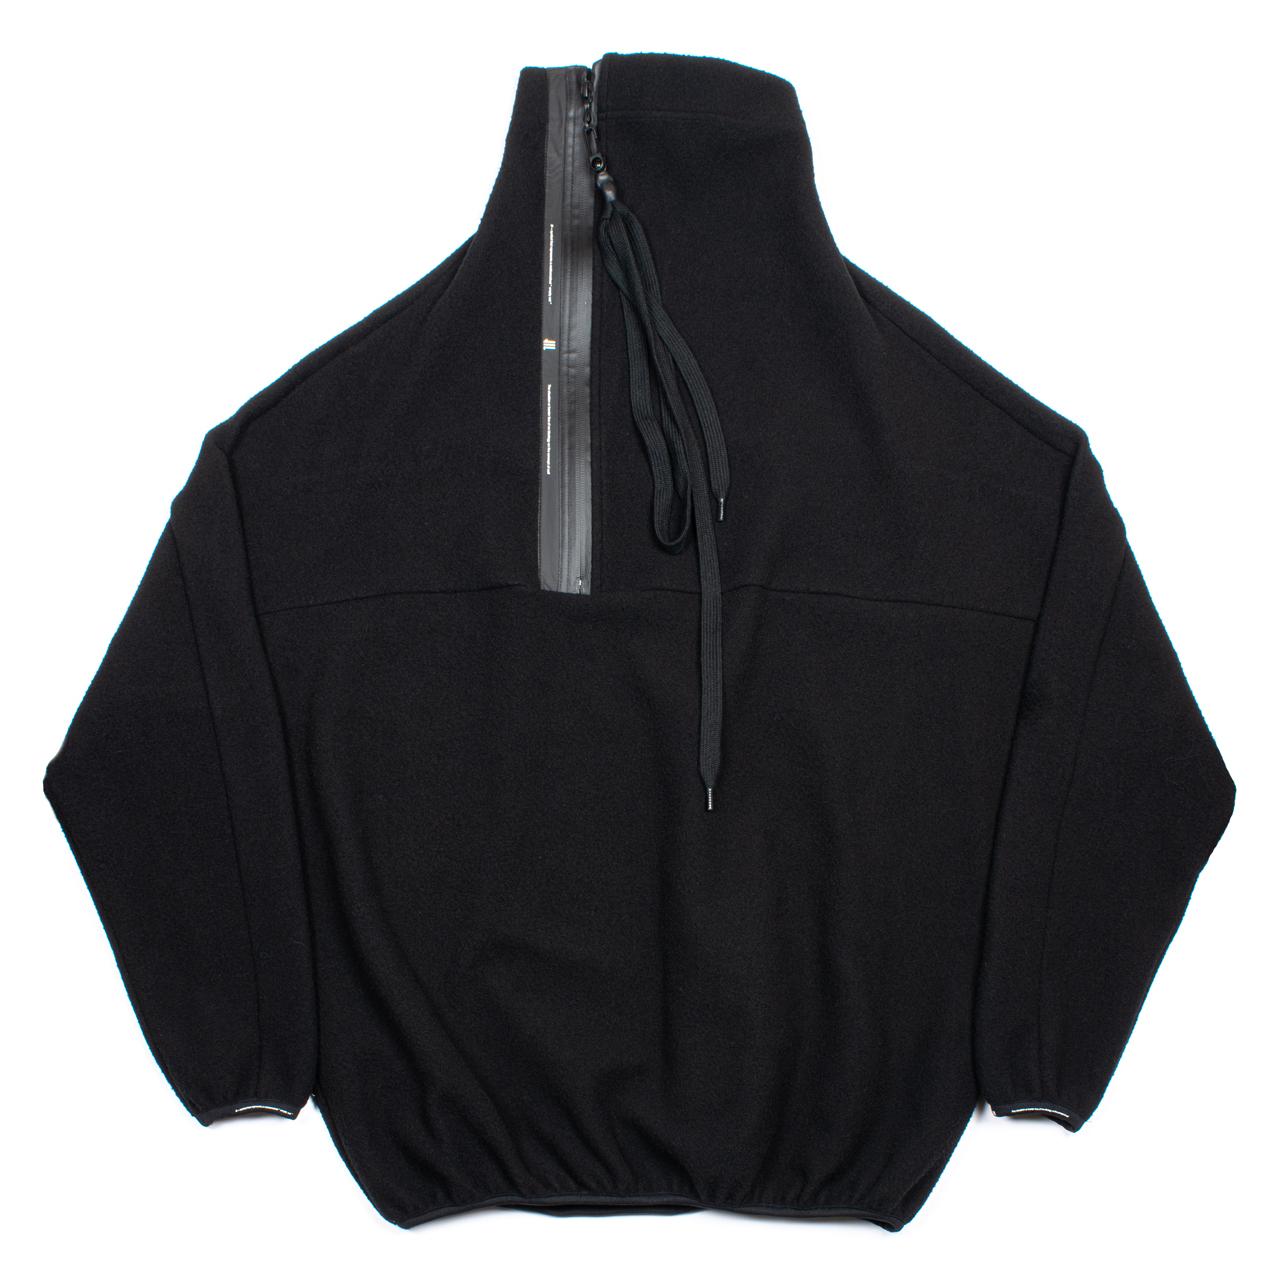 720BLM3-BLACK / フリース プルオーバー ジャケット